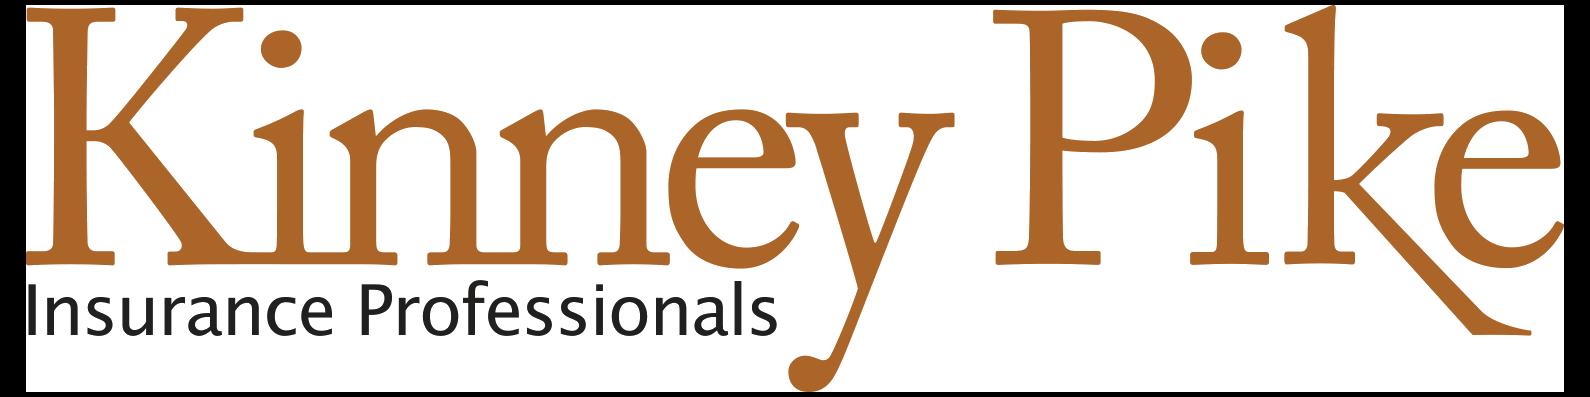 kinney_pike_insurance_logo.png